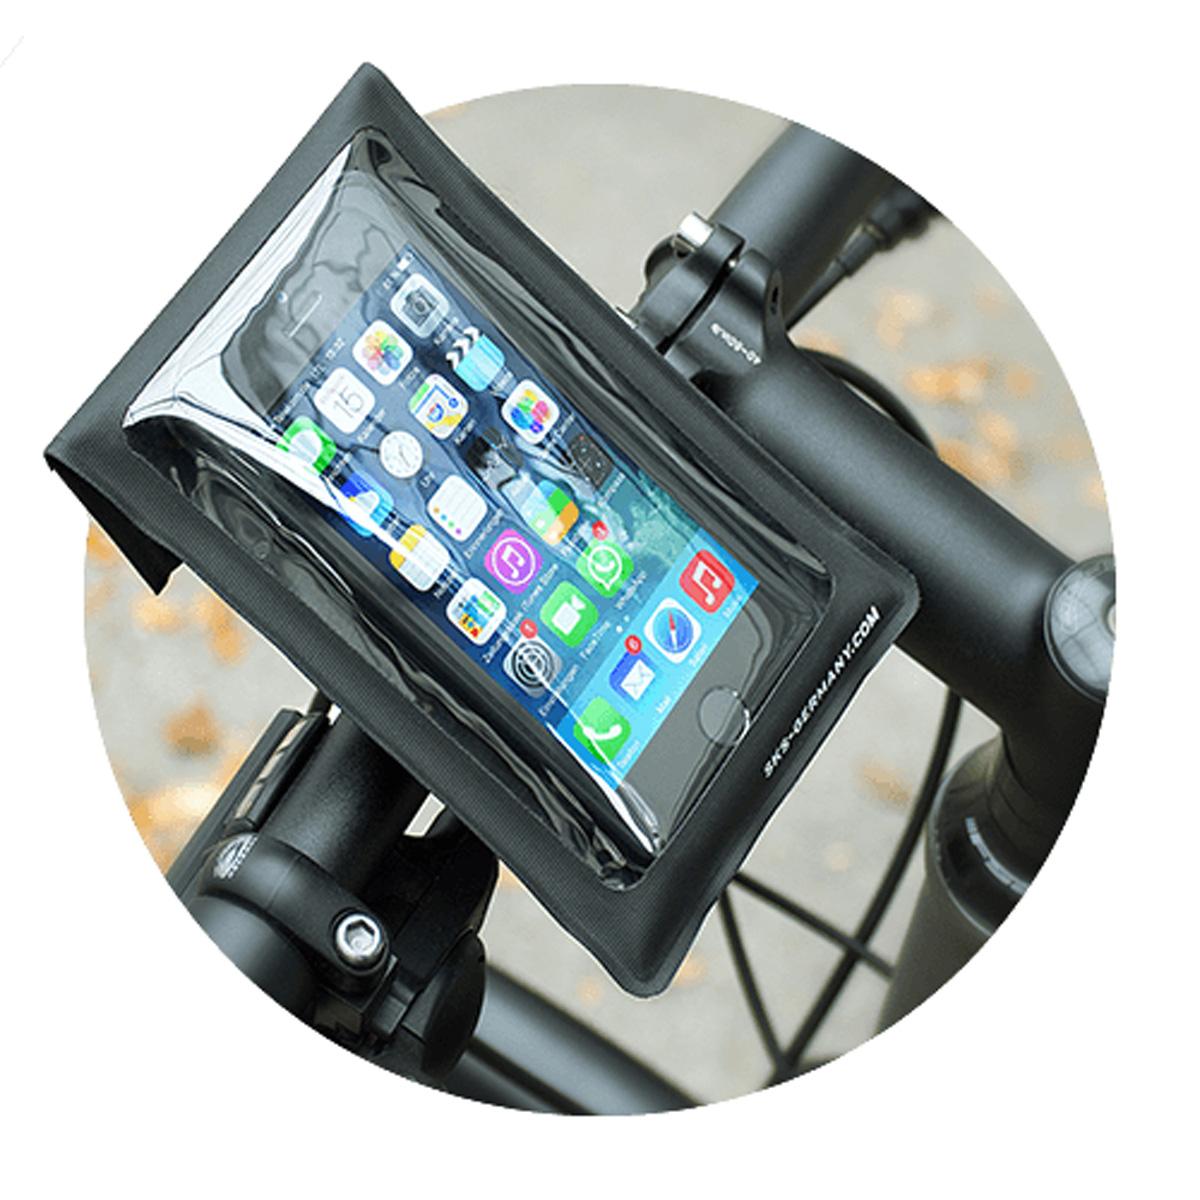 Buy Now SKS Smartboy Bicycle Handlebar Smartphone Holder – 11234 Before Special Offer Ends